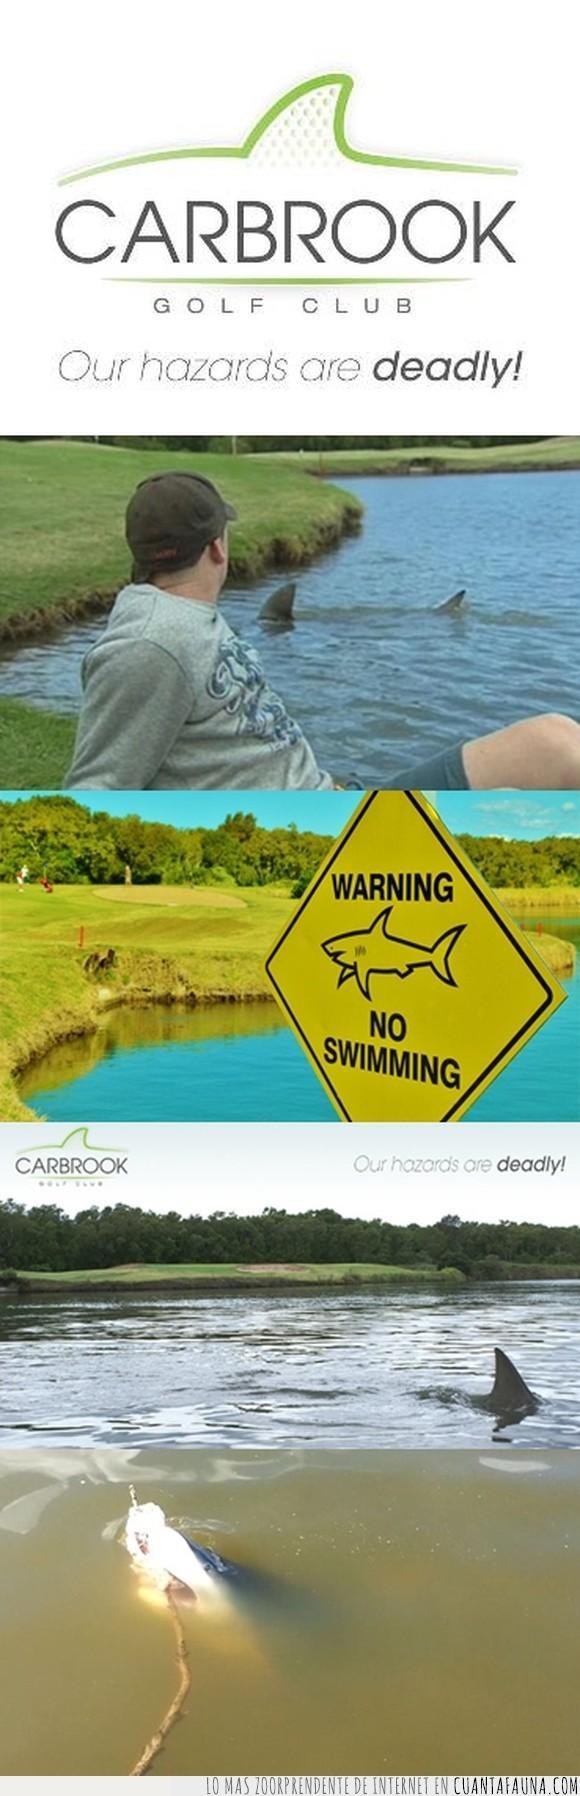 Australia,Carbrook Golf Club,golf,laguna,nadie va a por las pelotas que caen al agua,tiburón toro,tiburones